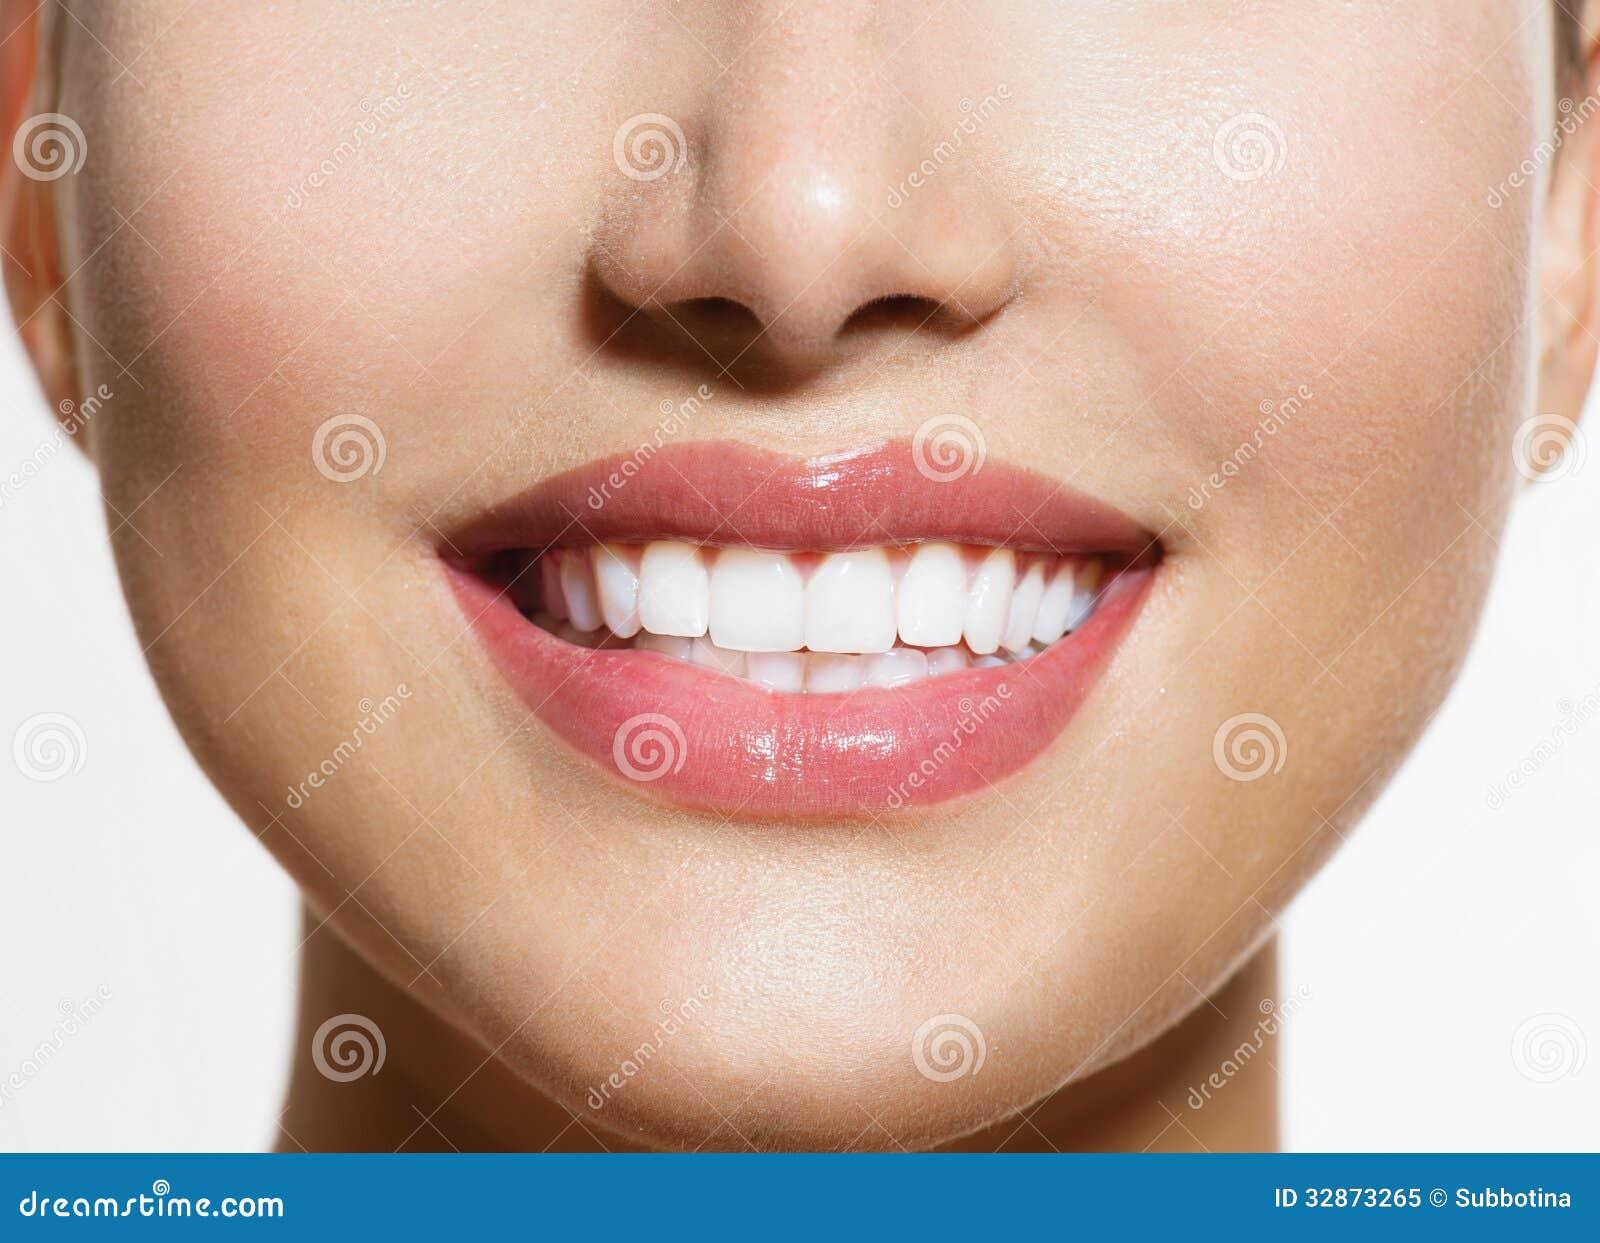 Healthy Smile. Teeth Whitenin